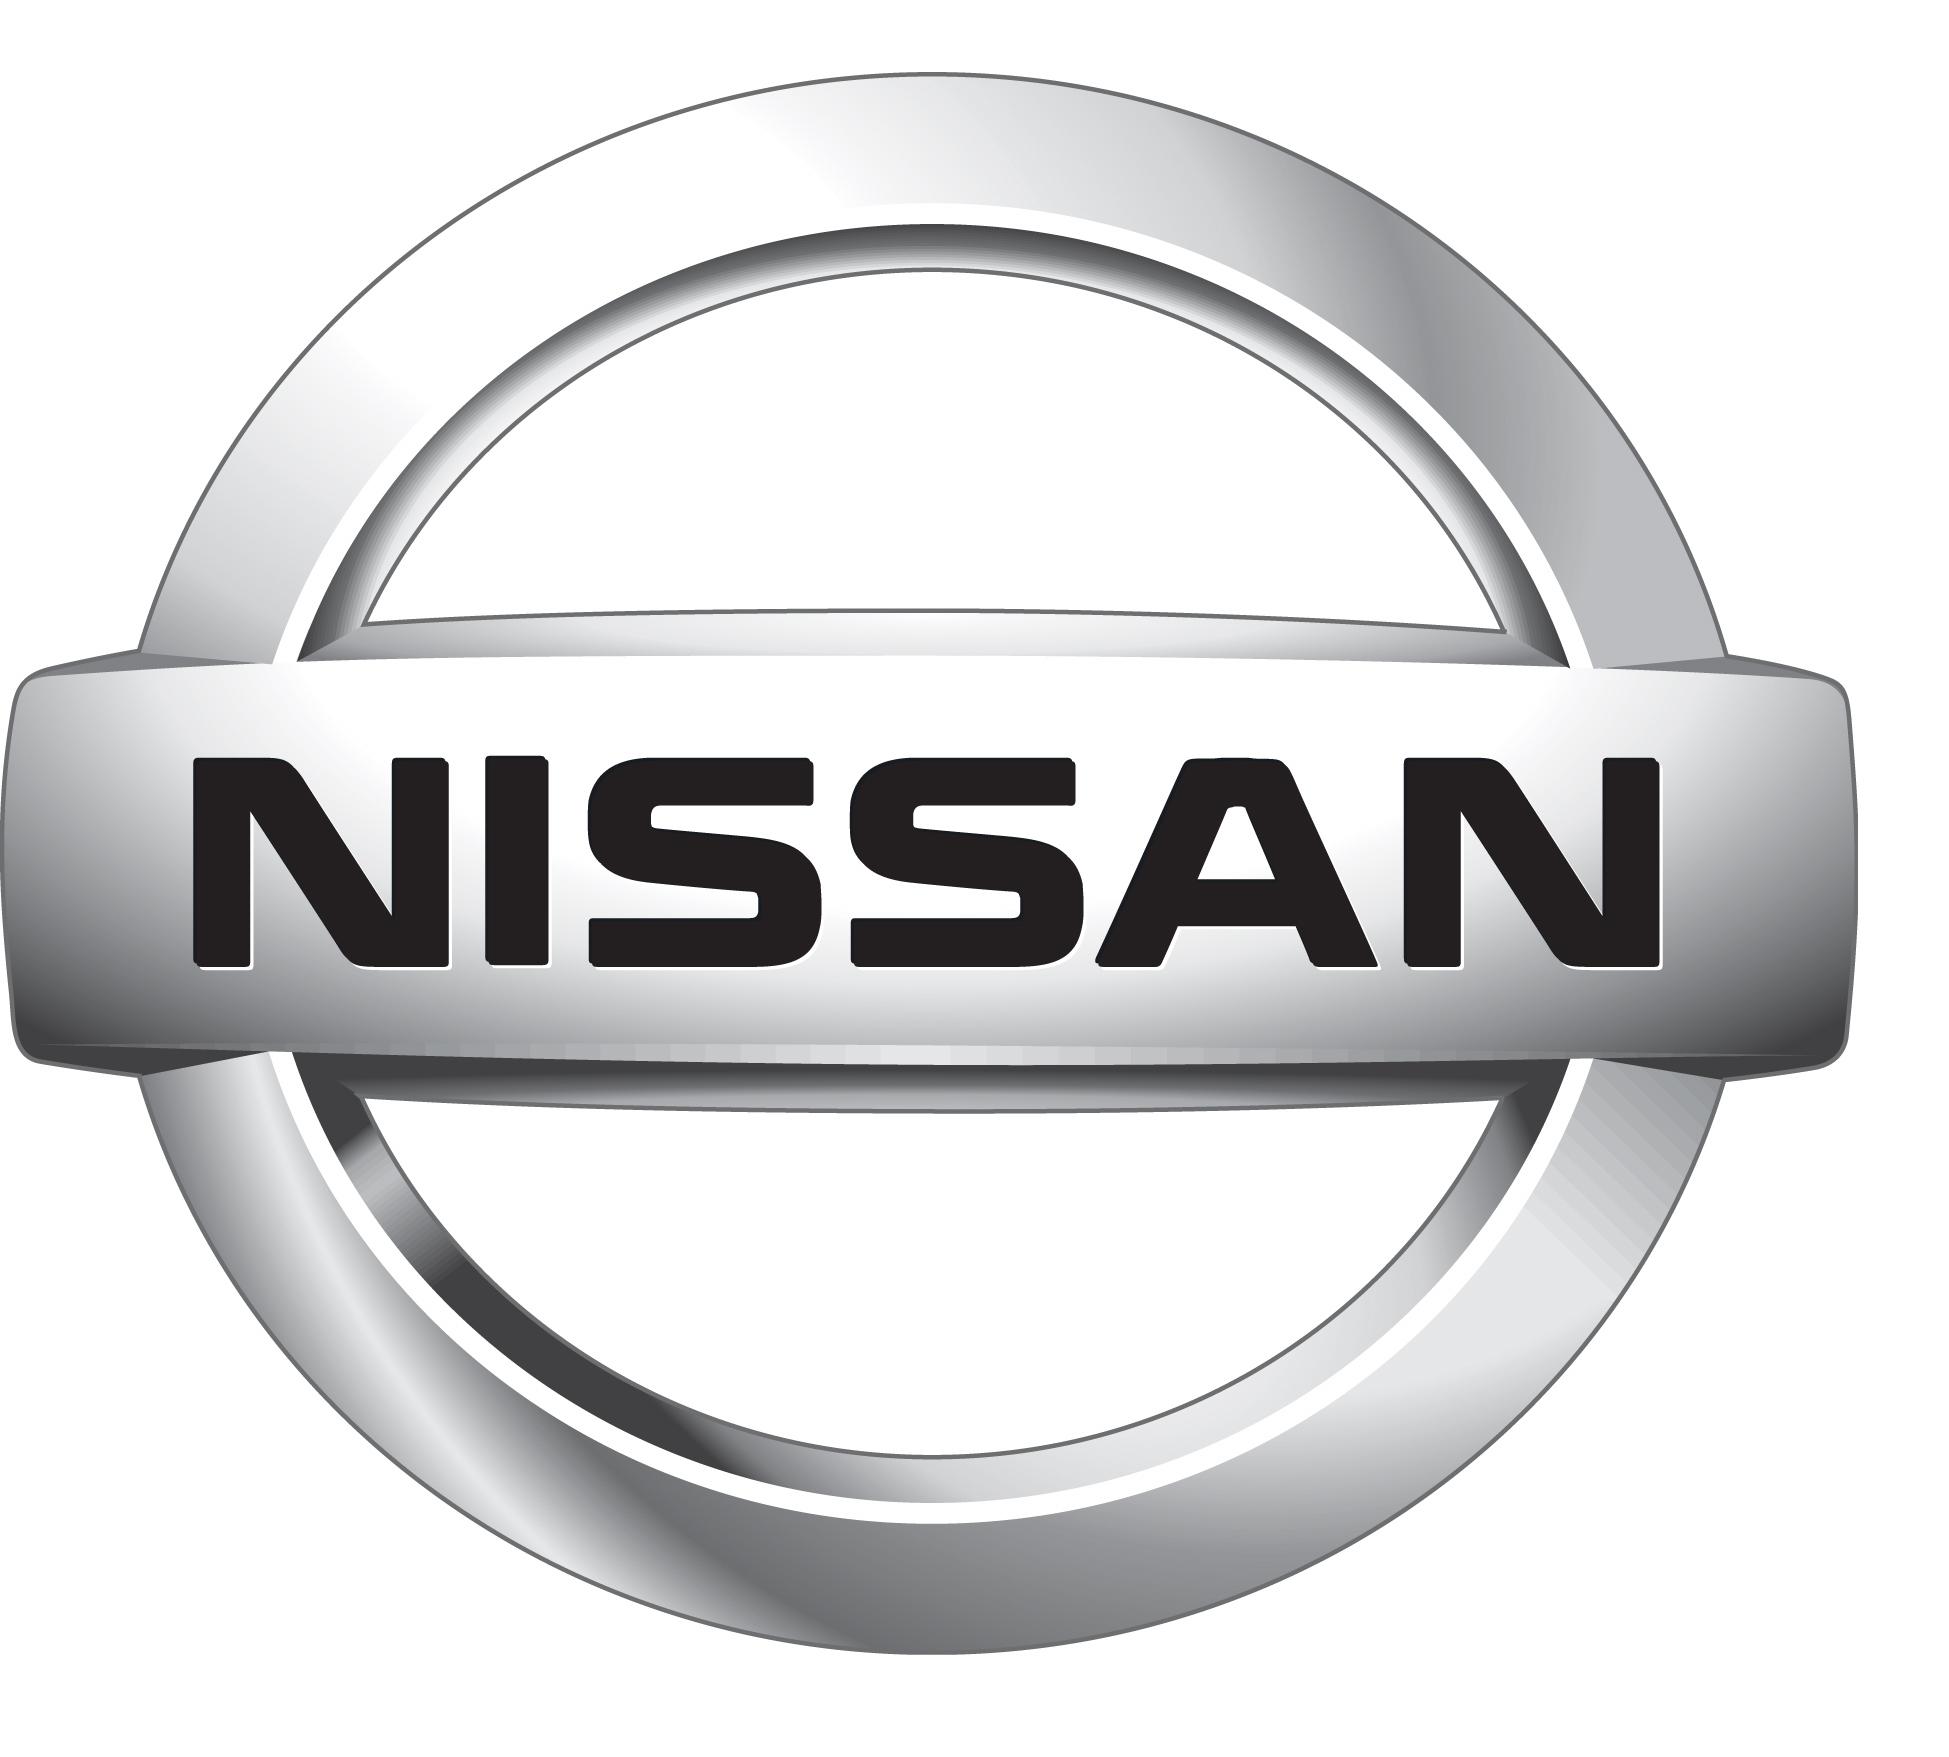 Nissan-logo-5.jpg